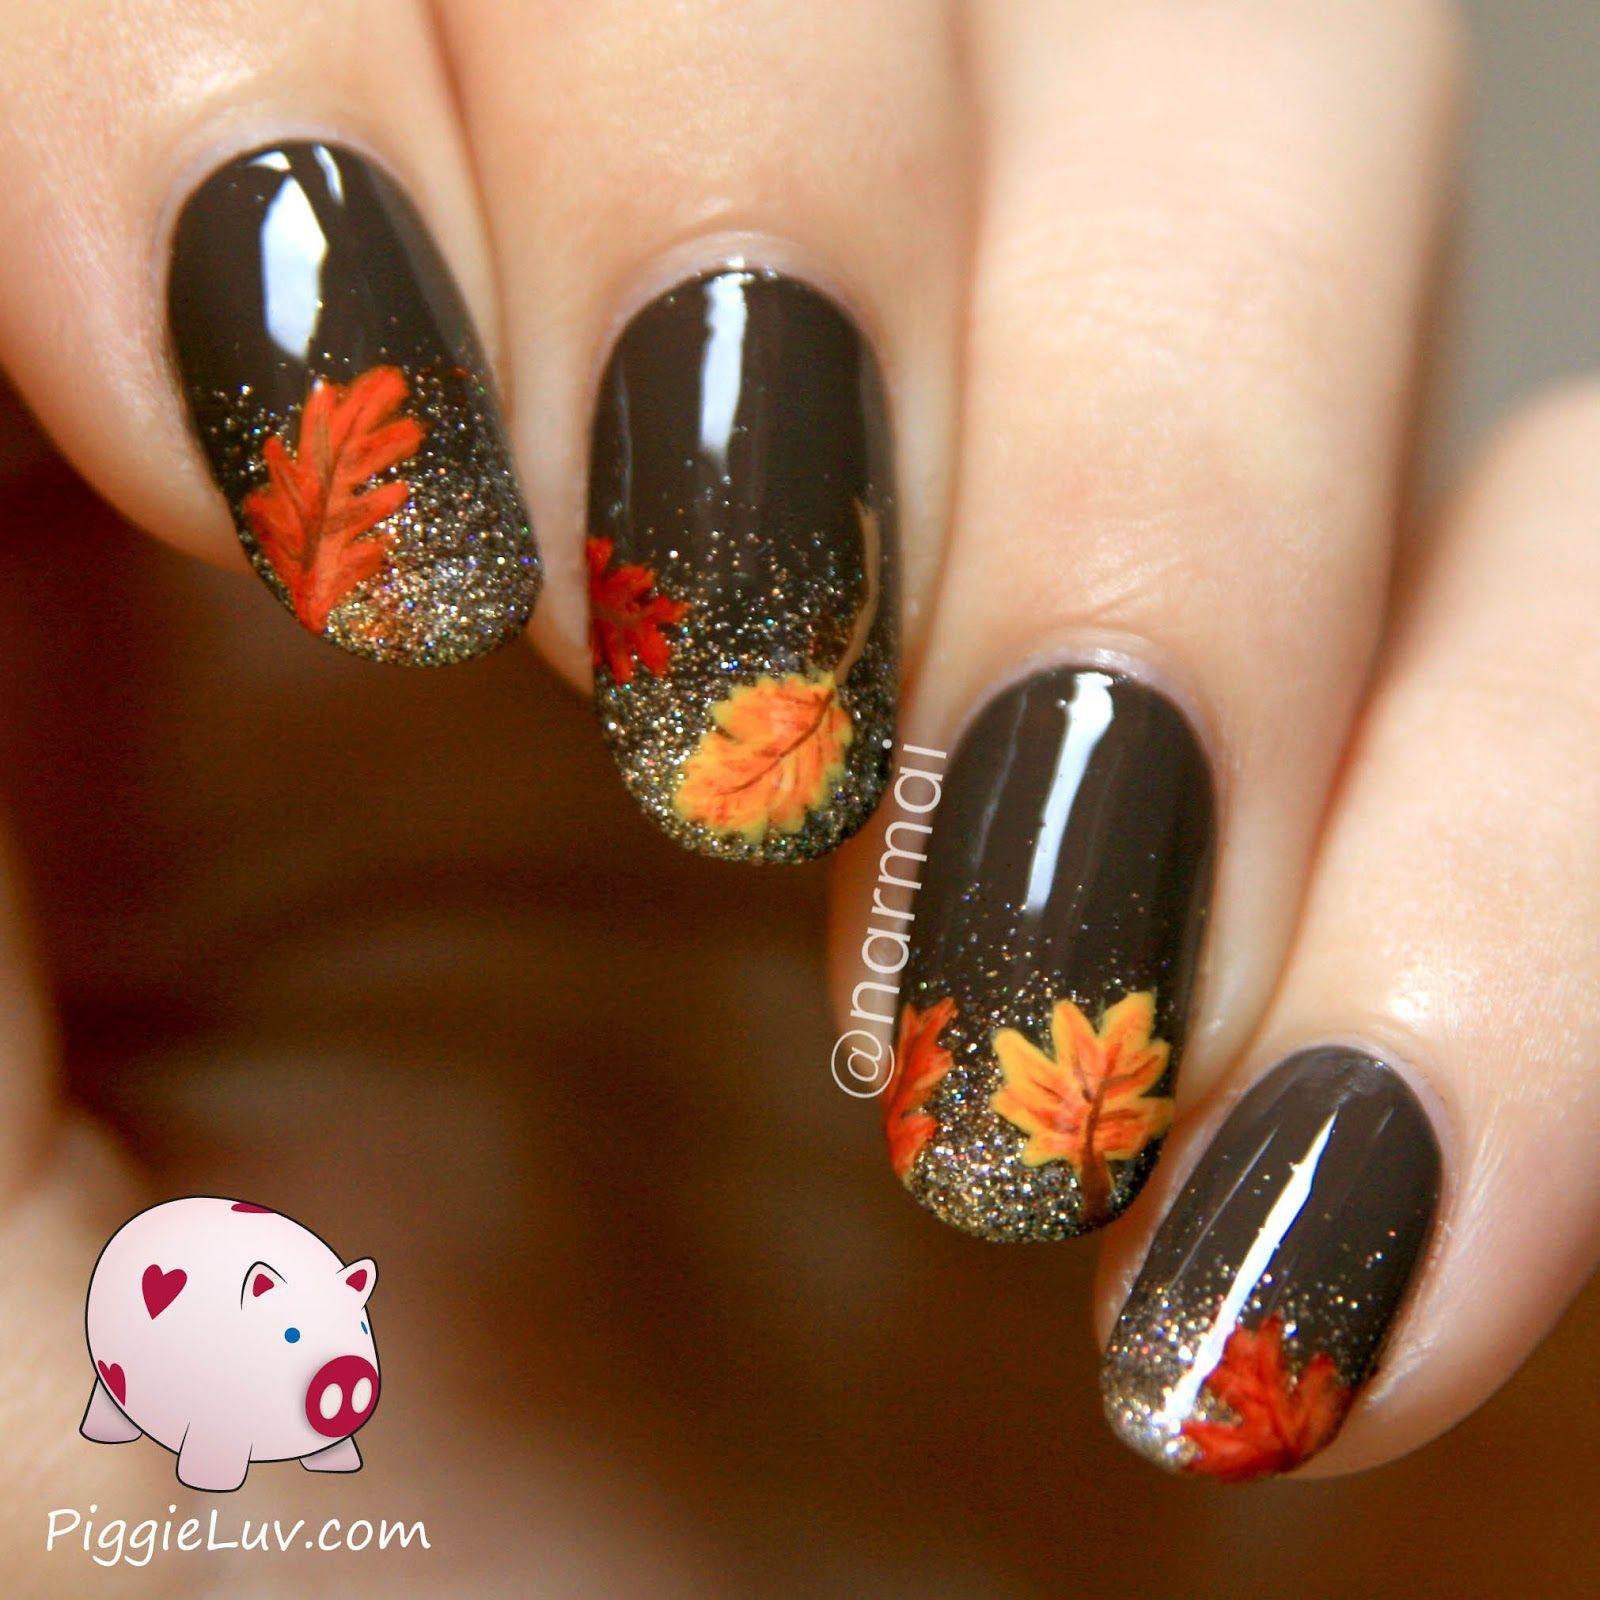 Fall Nail Art Autumn Leaves On Glitter Gradient Fall Nail Art Designs Fall Nail Art Nail Art Designs